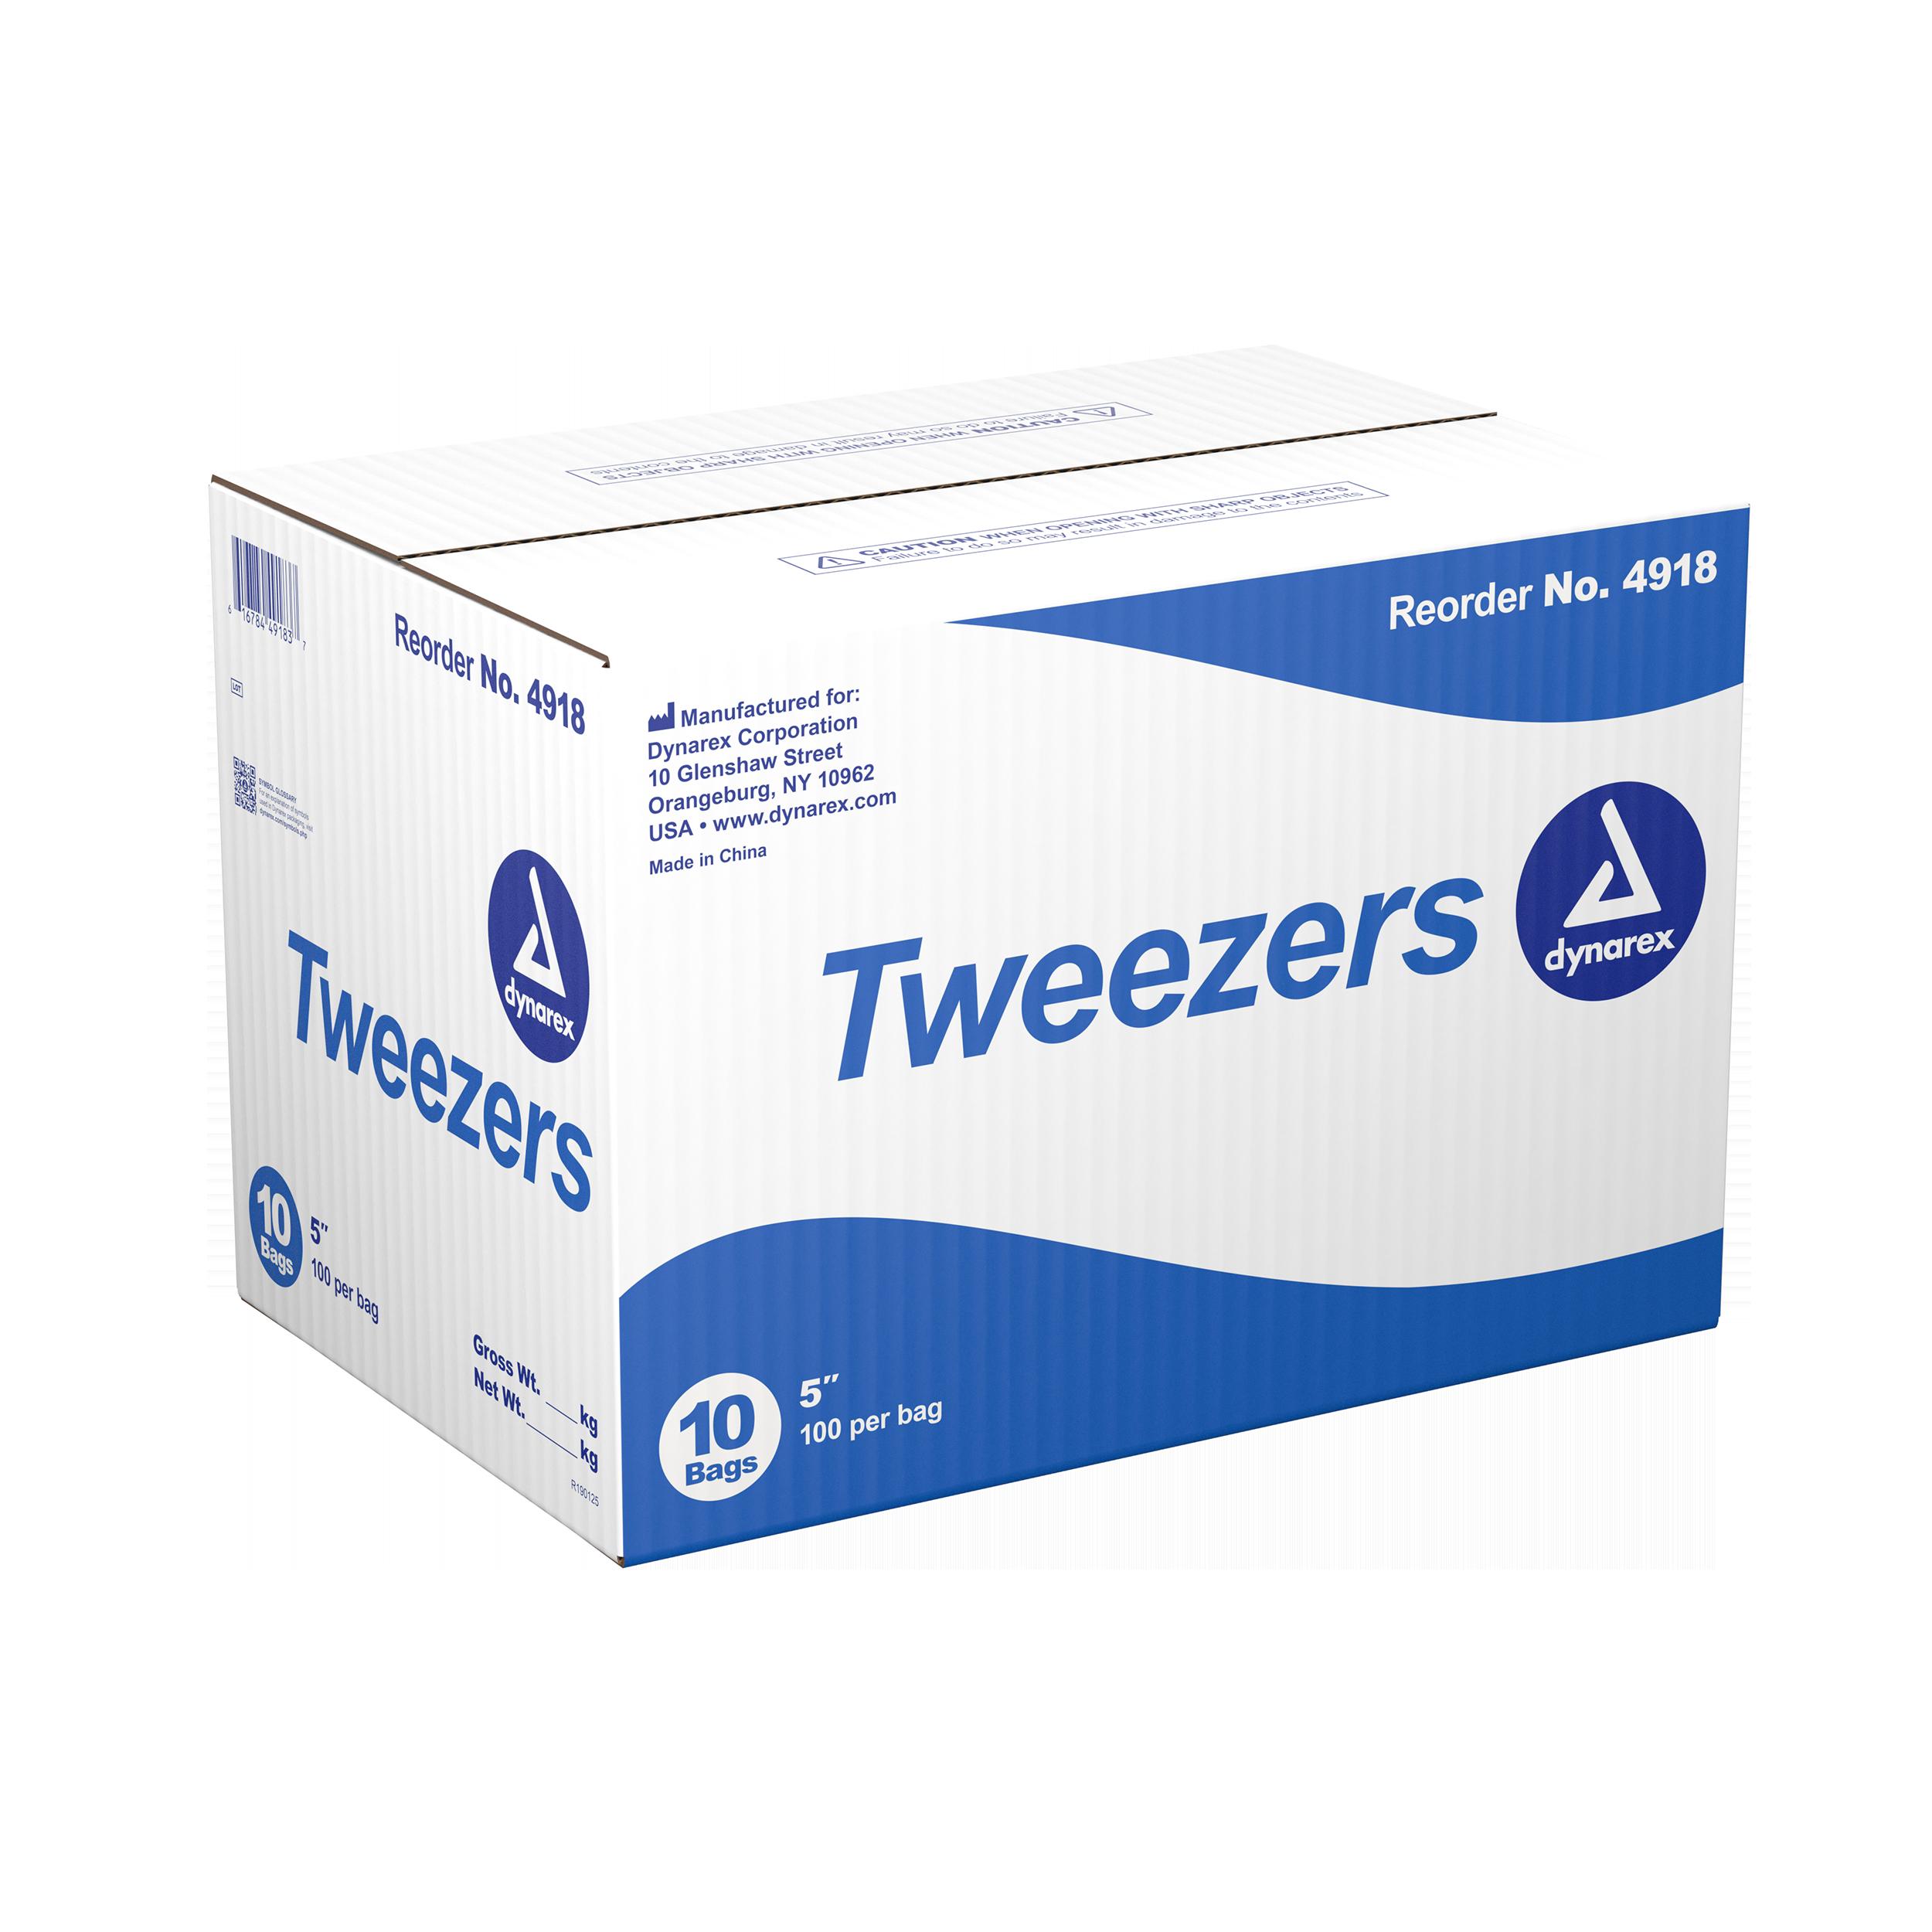 Plastic Tweezers - Individually Wrapped - 4.25